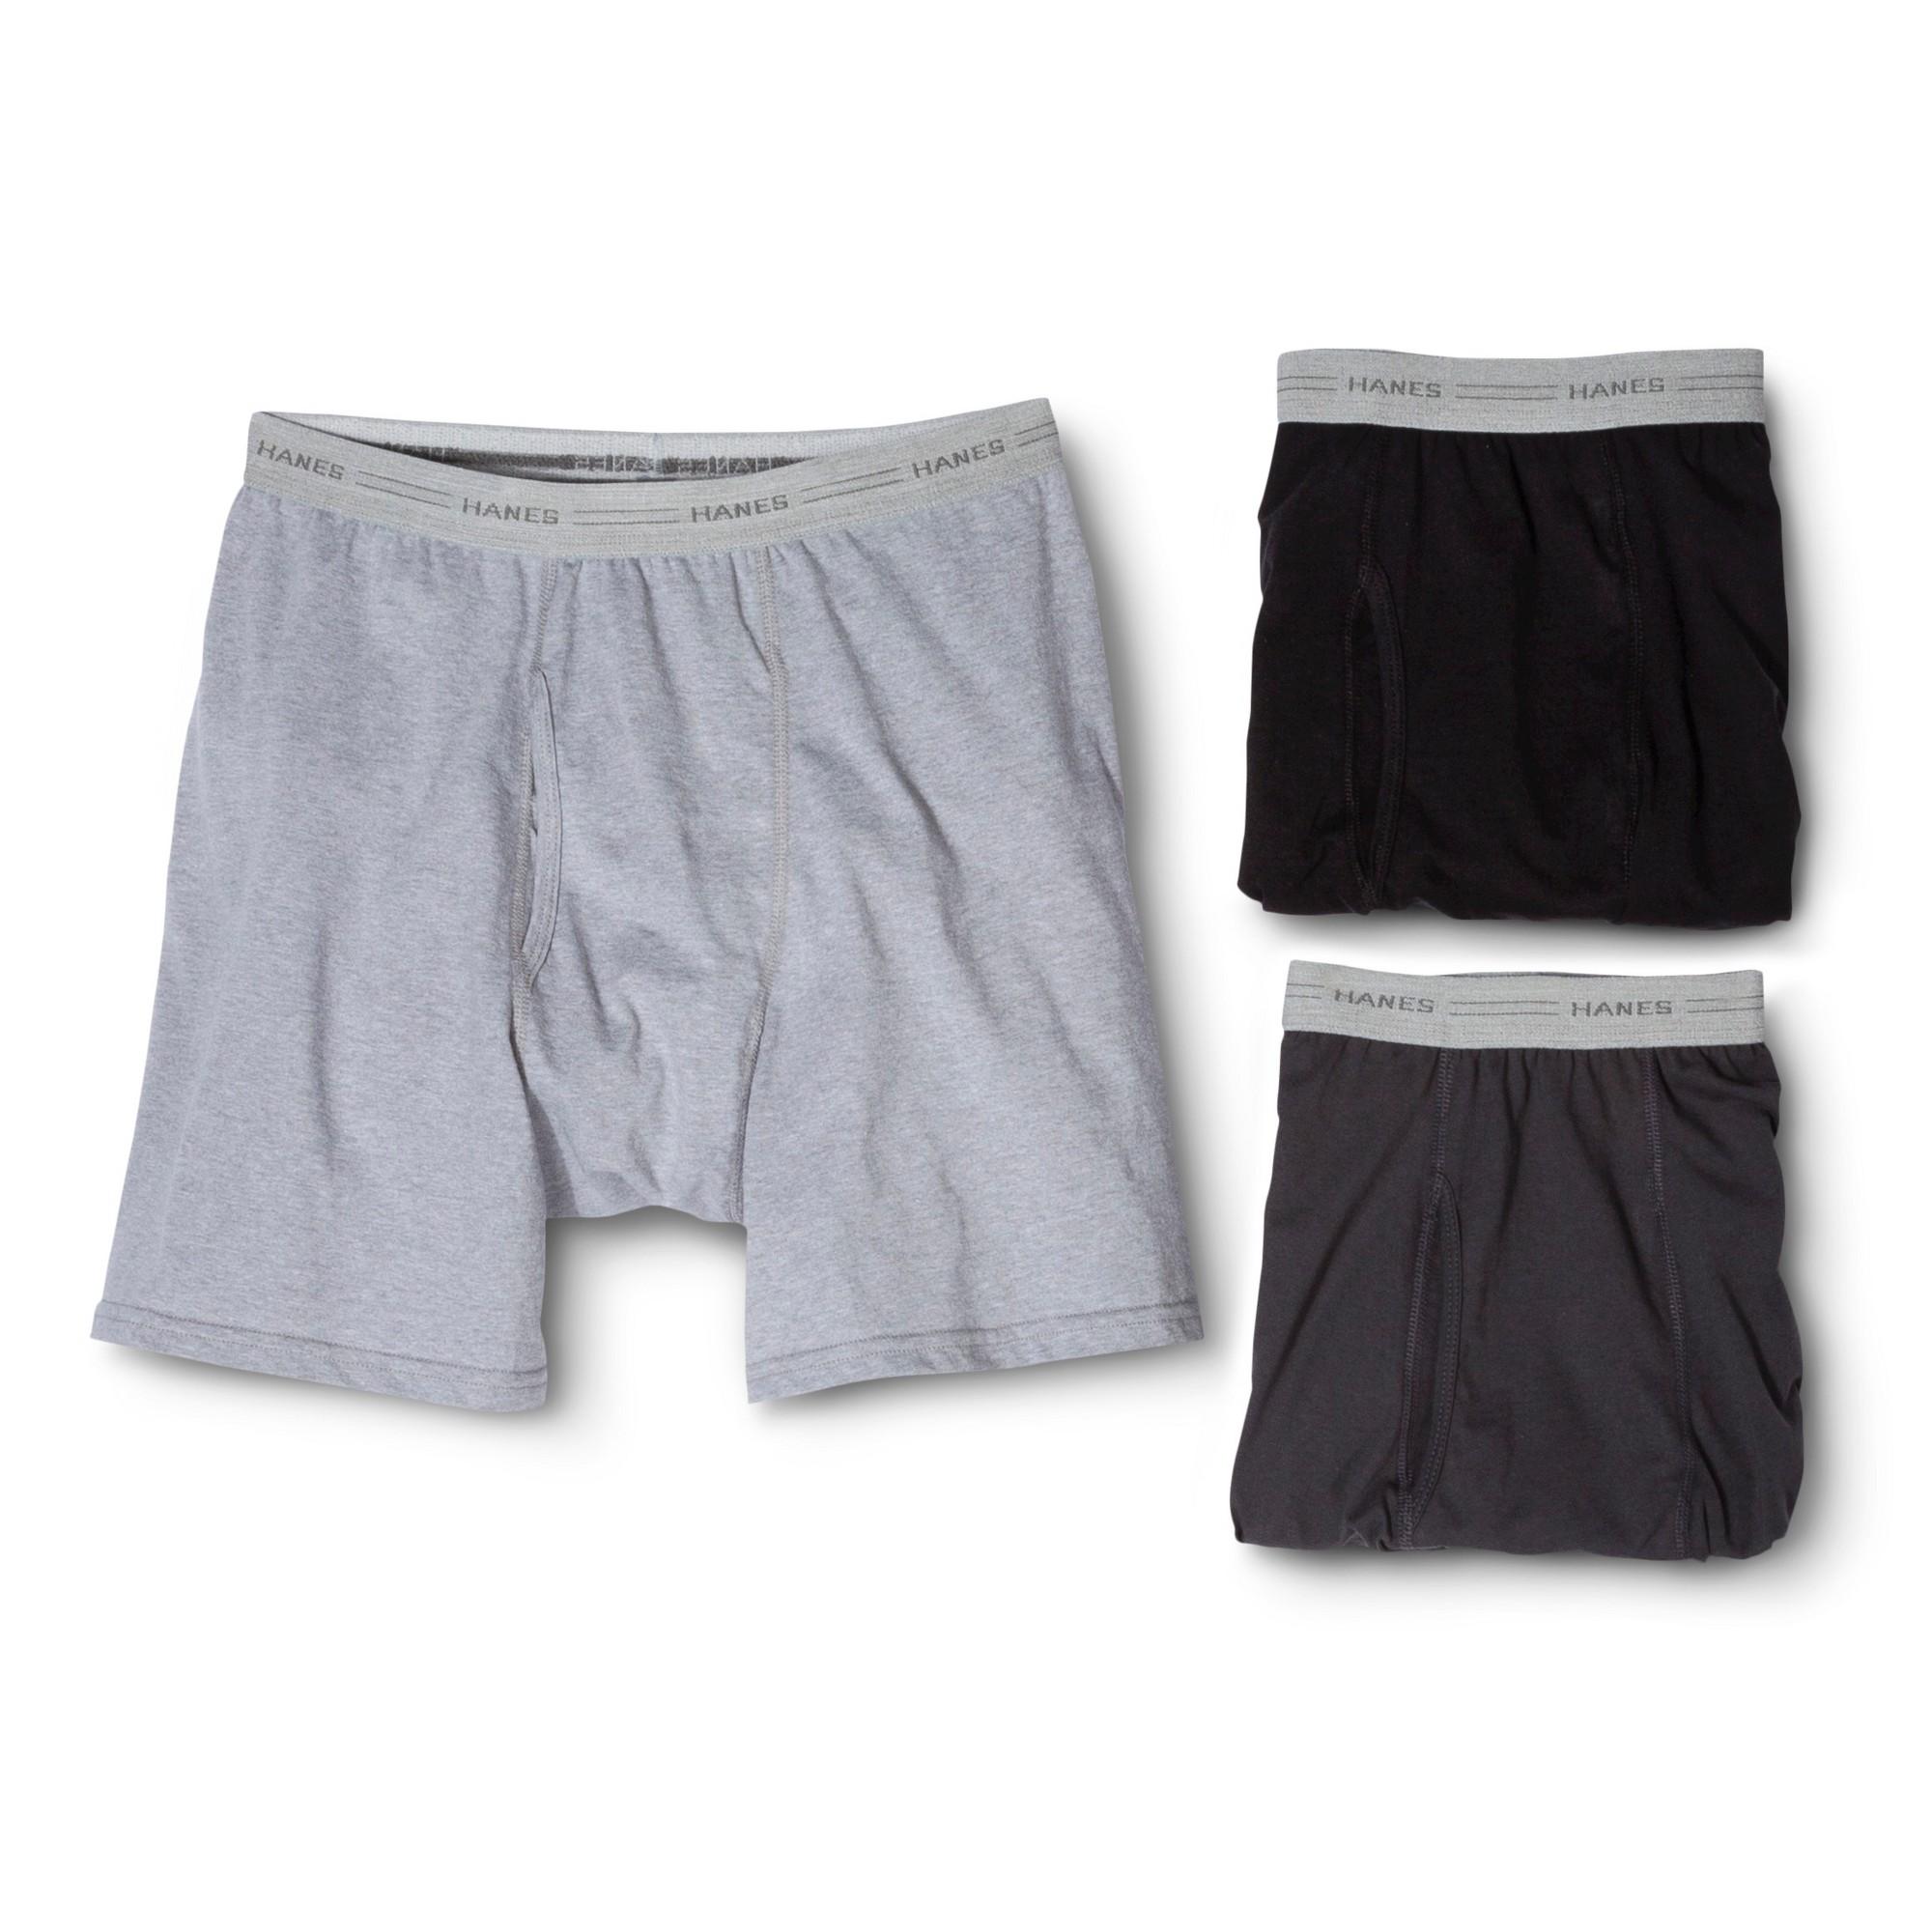 Hanes Men's 3pk Comfort blend Boxer Briefs - S, Size: Small, Gray Black